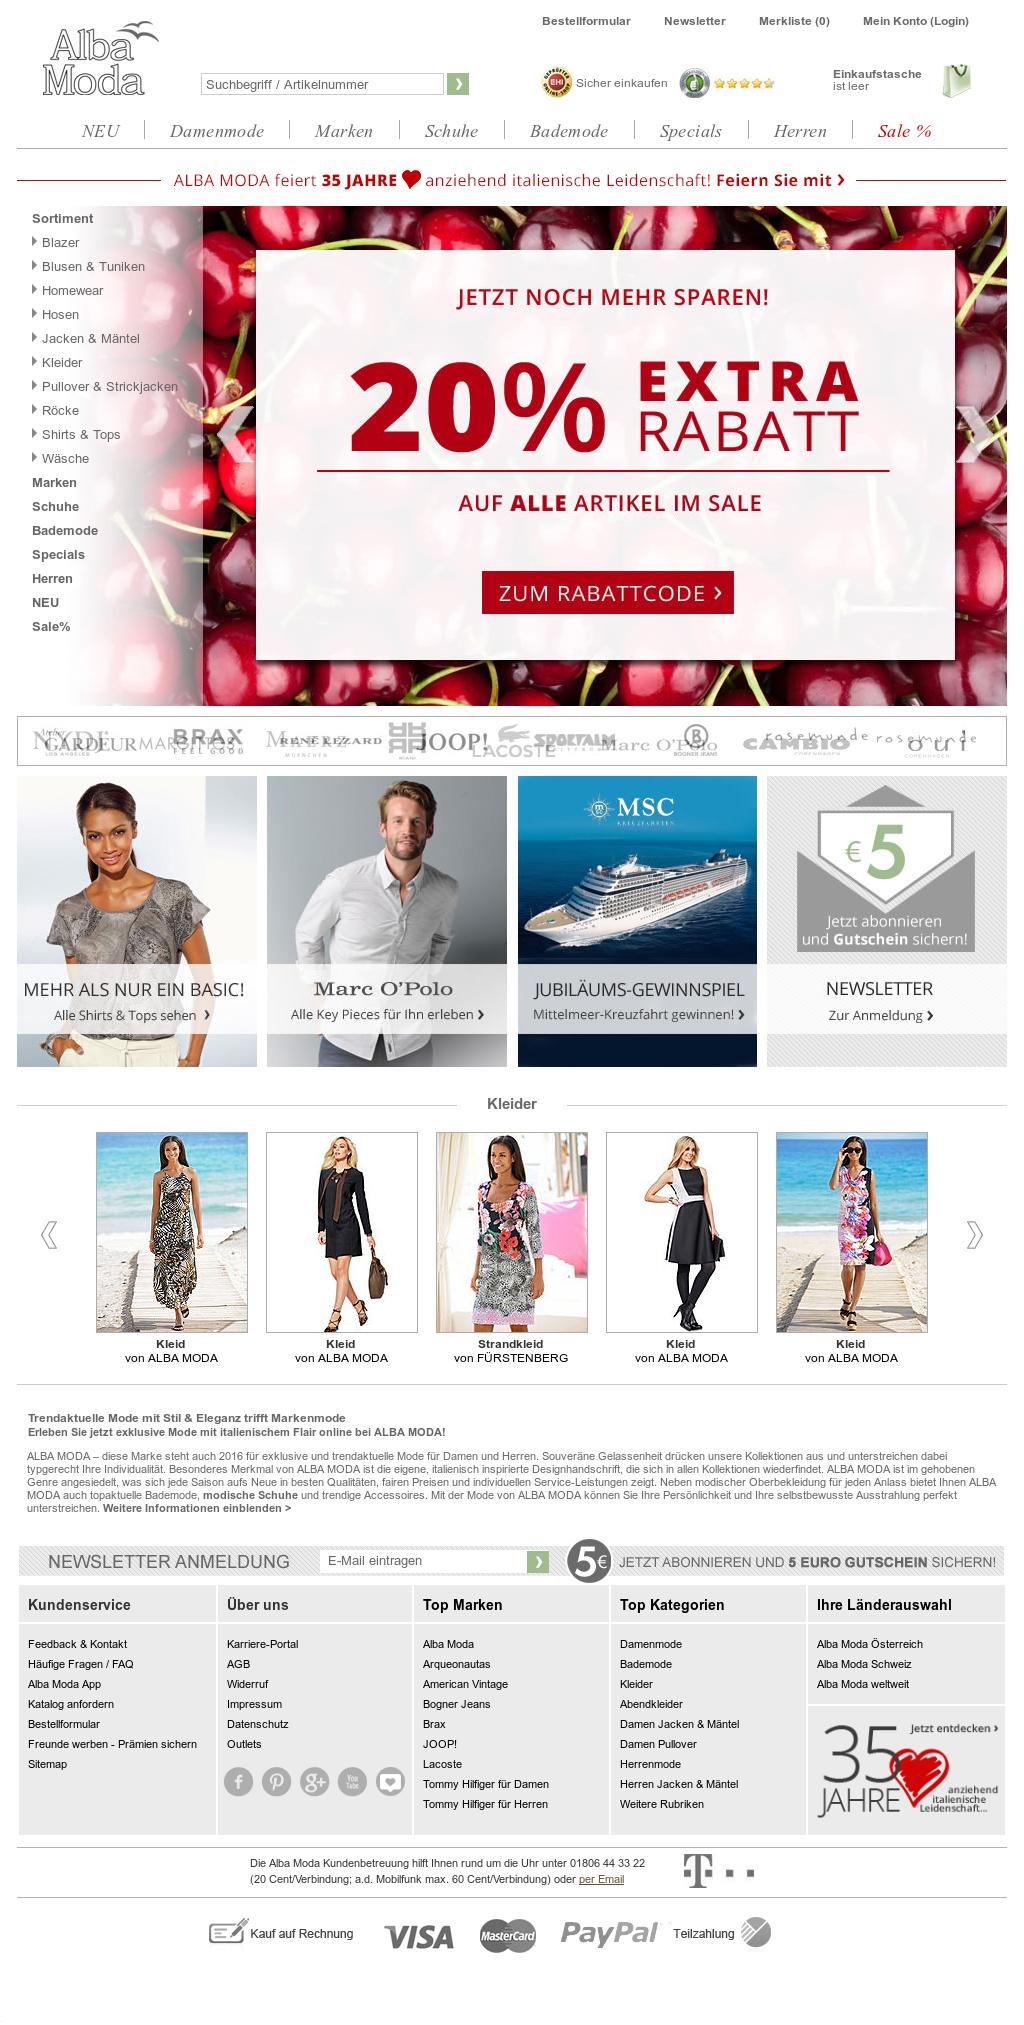 100% authentic 89706 1c874 Albamoda Competitors, Revenue and Employees - Owler Company ...